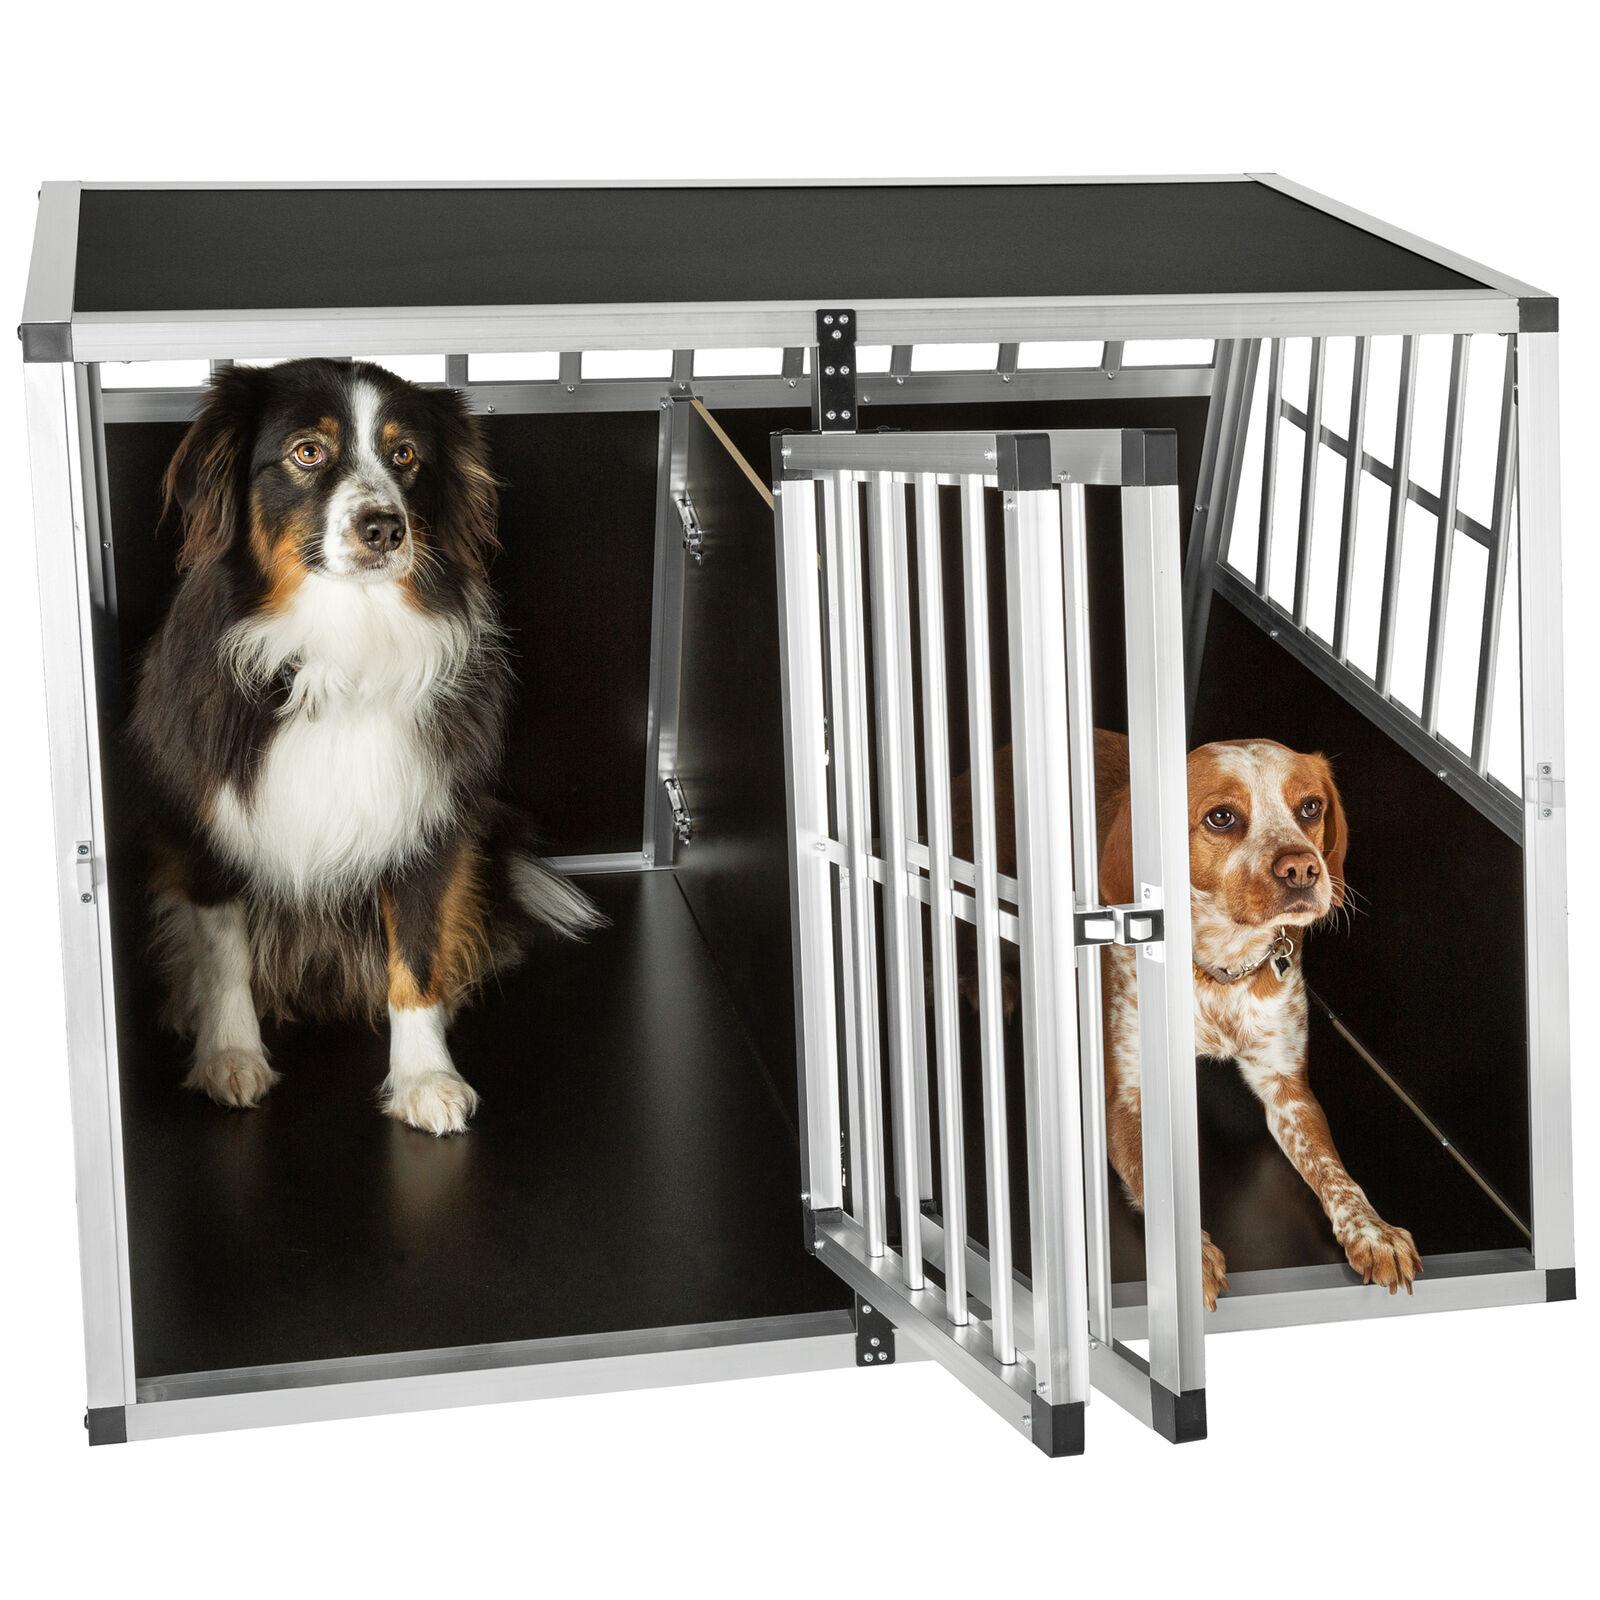 XXL Alu Doppel Hundebox mit Trennwand Transportbox Hundetransportbox B-Ware B-Ware B-Ware 07f578